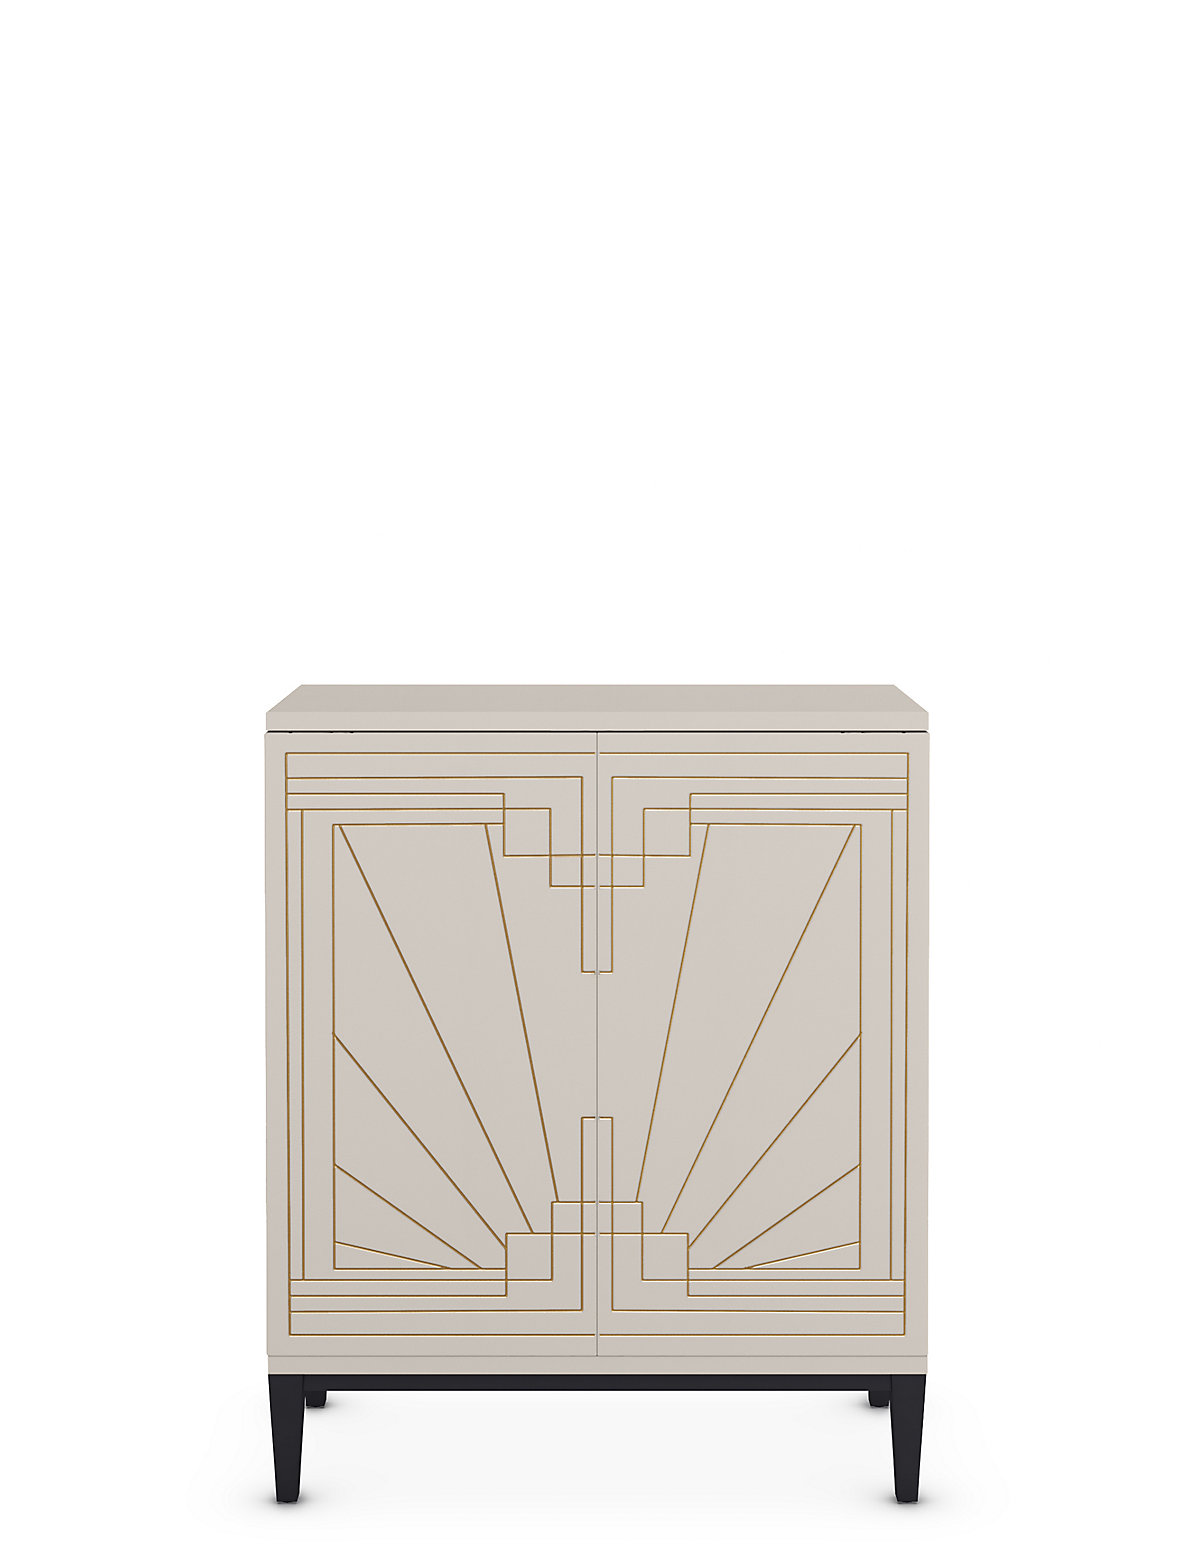 Carraway Drinks Cabinet